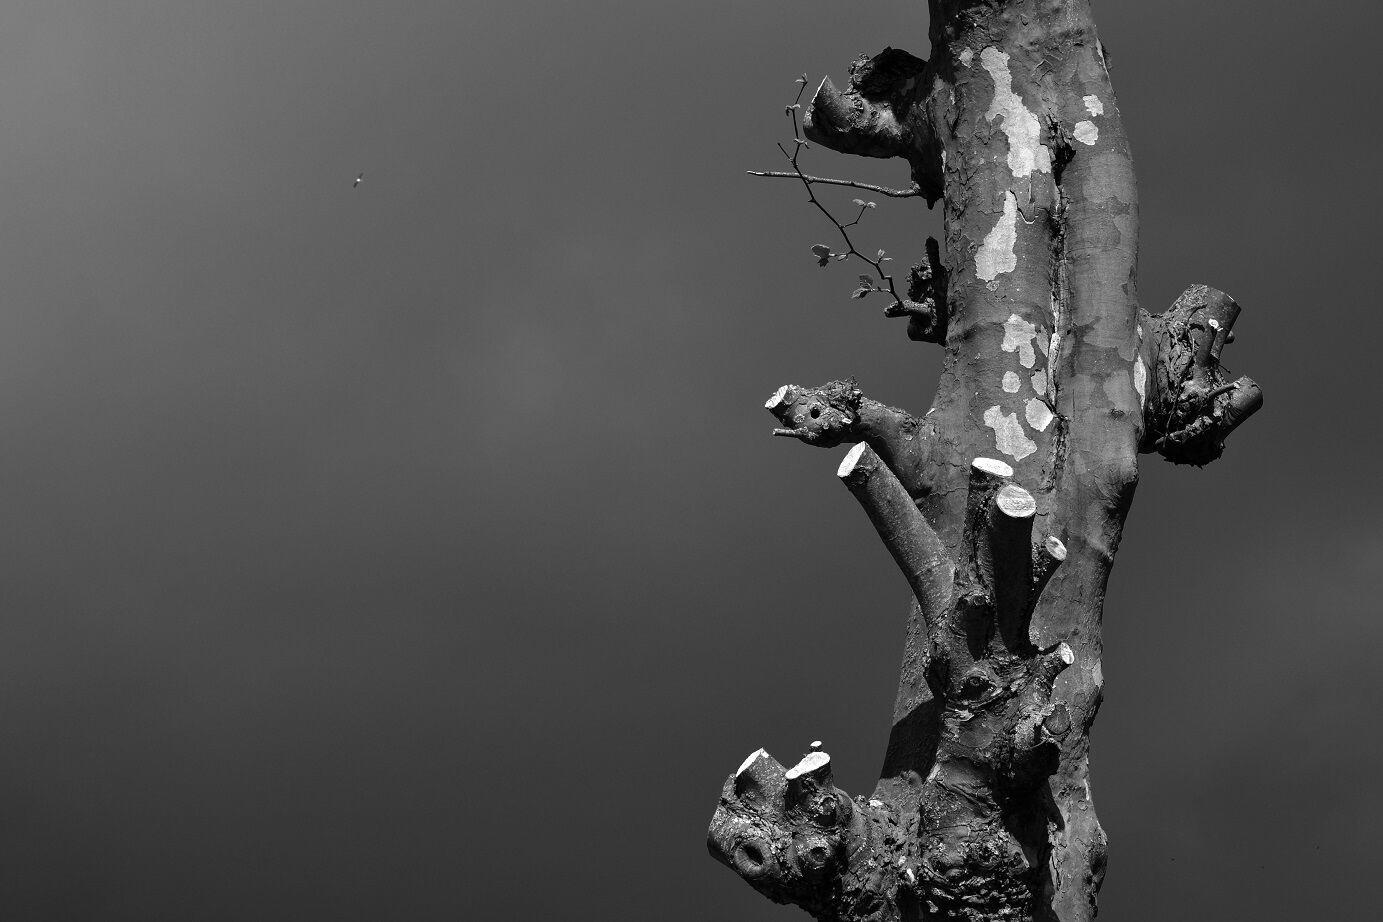 Dark sky by Willemijn Wahl